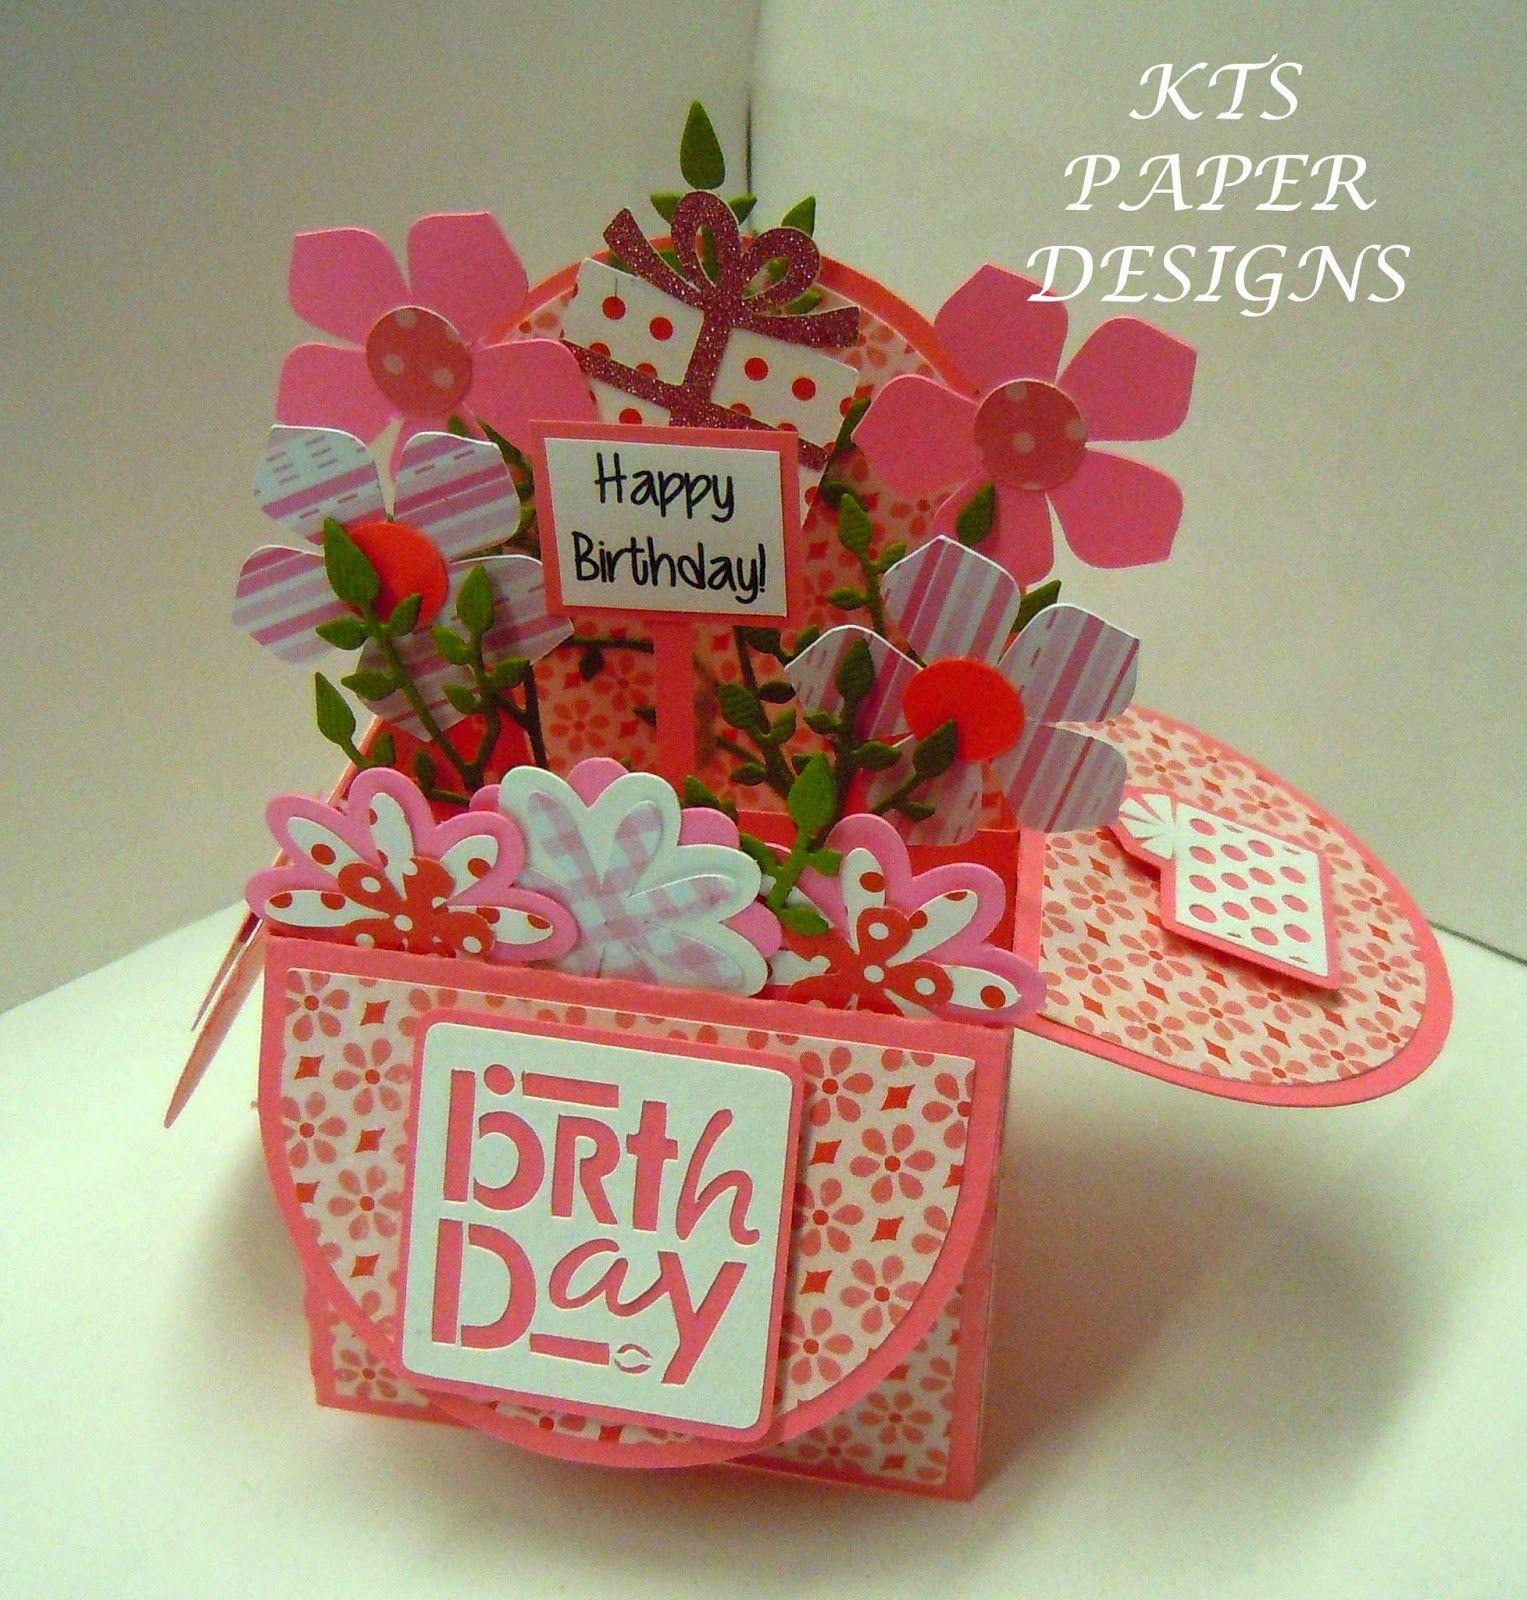 KTS Paper Designs: Card in a Box - Birthday